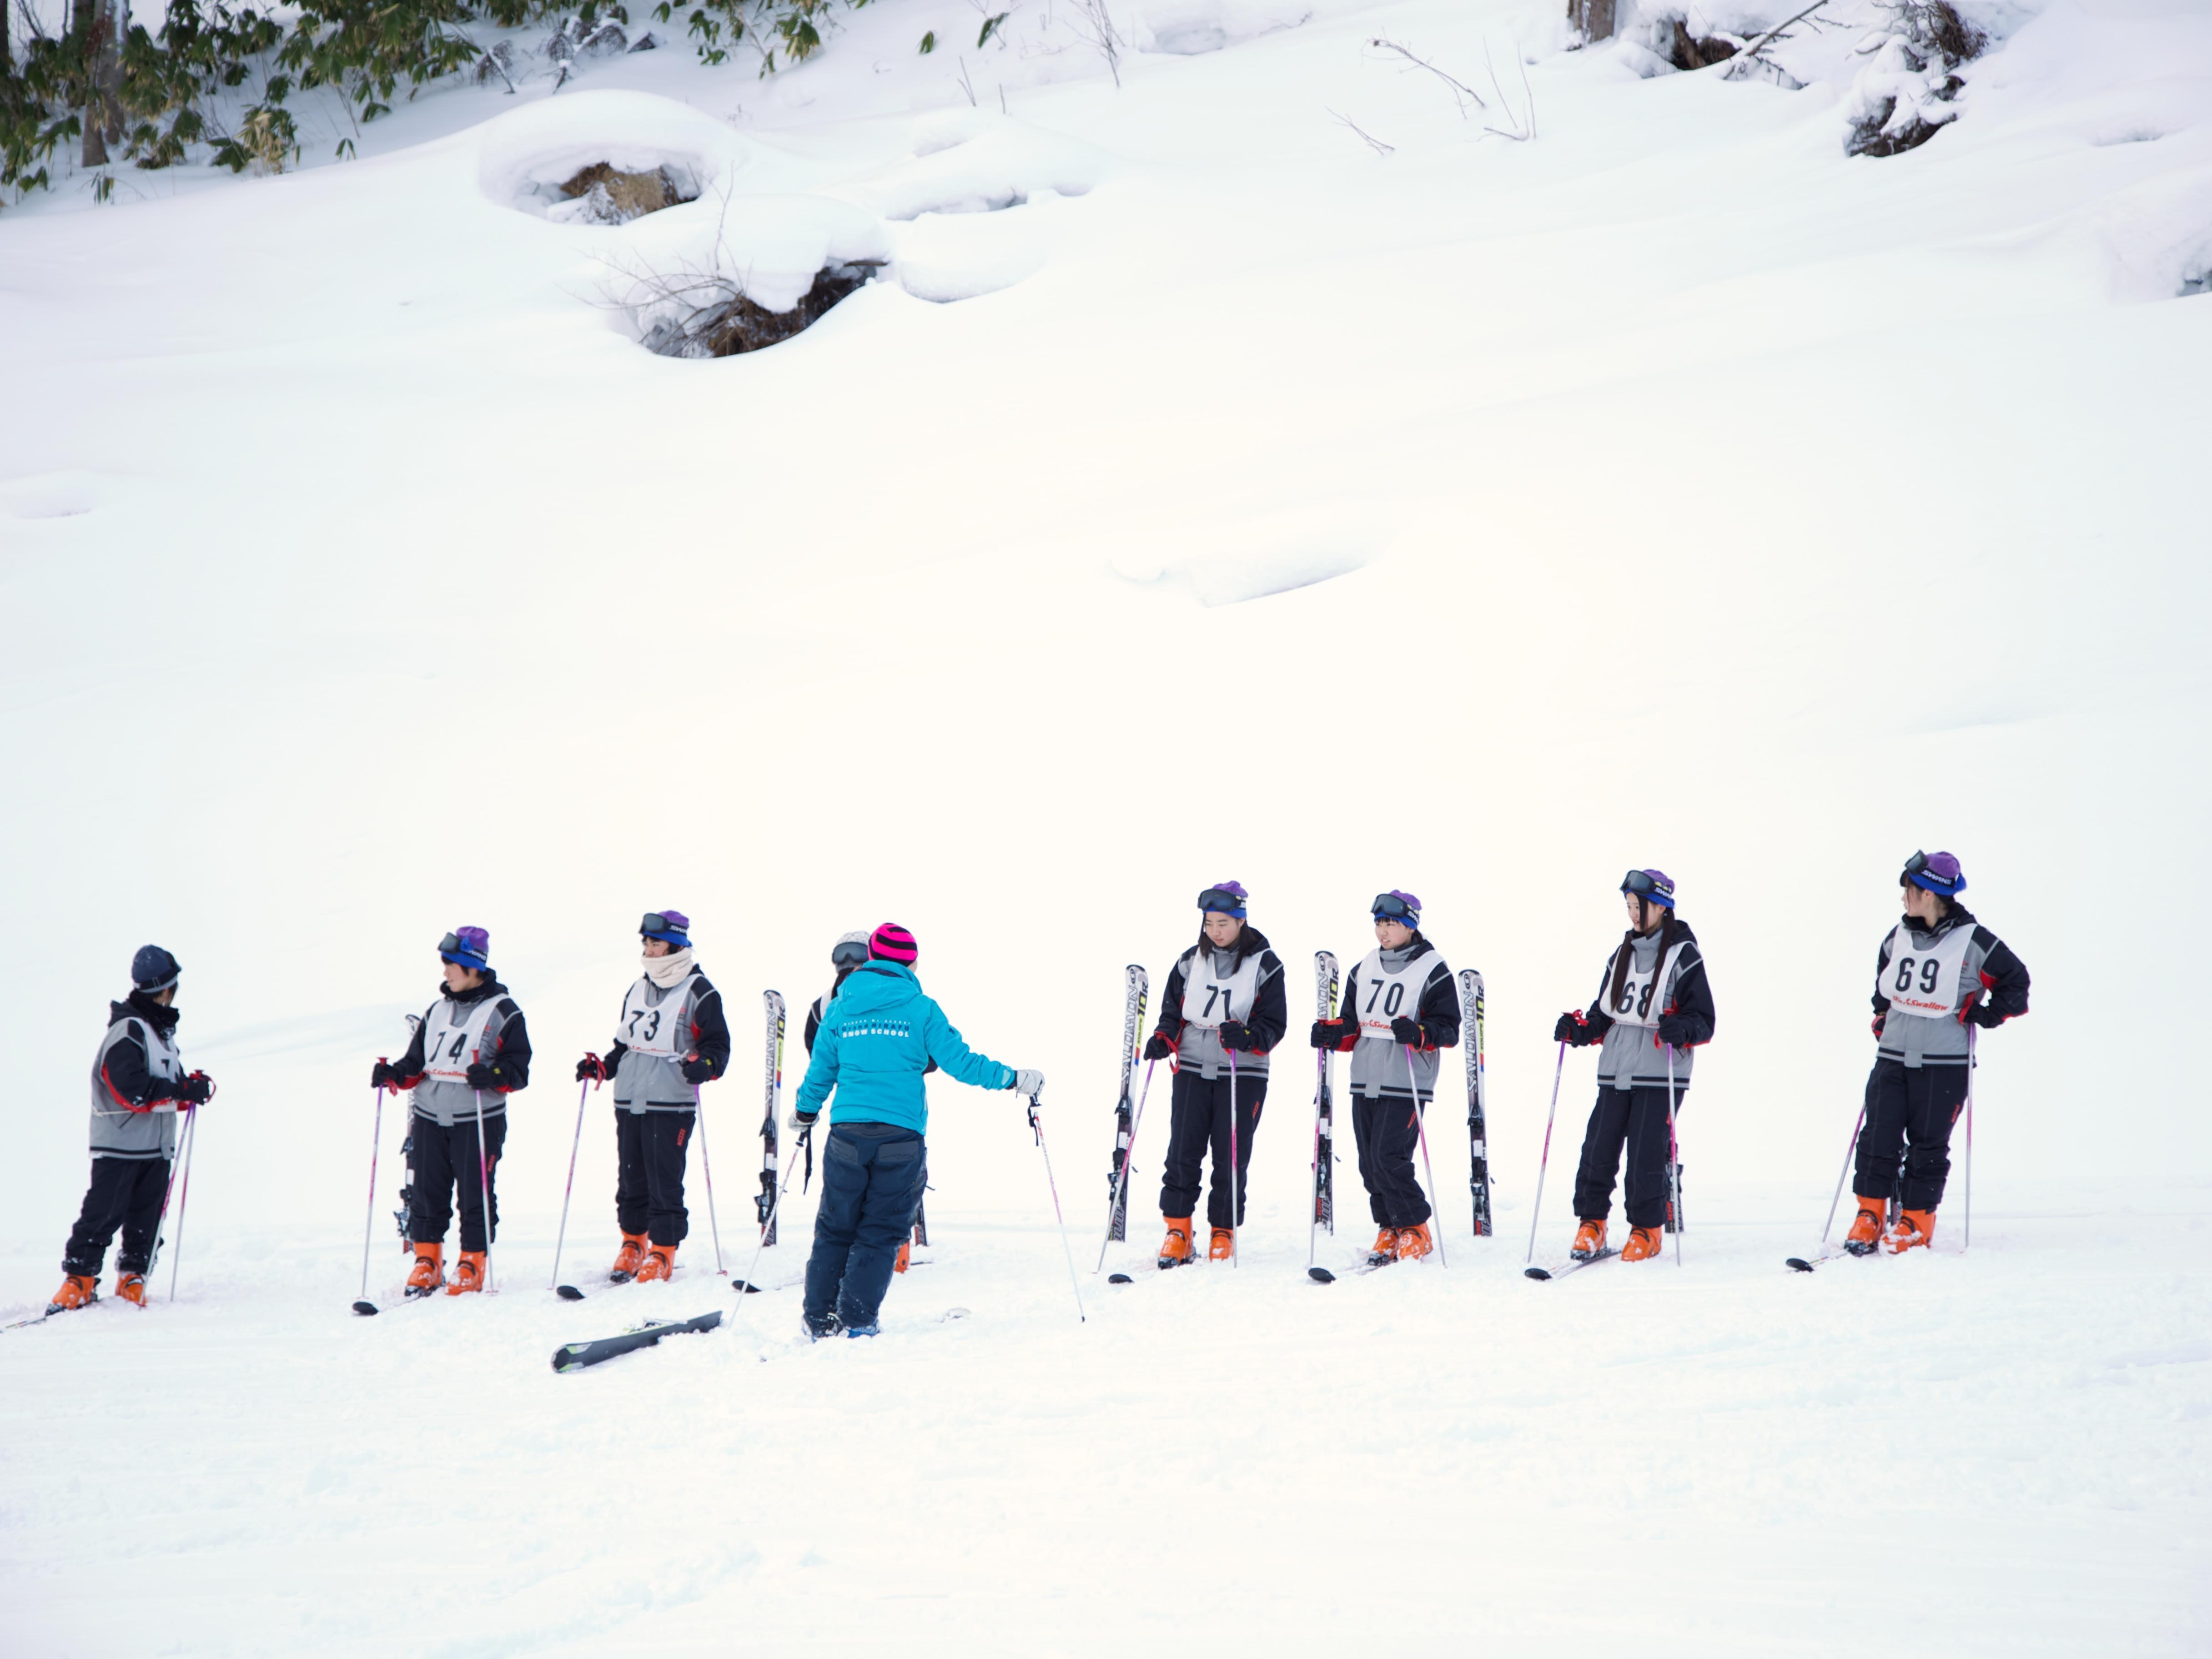 Snowboard lessons teaching in Snow school near Chatrium Niseko Japan